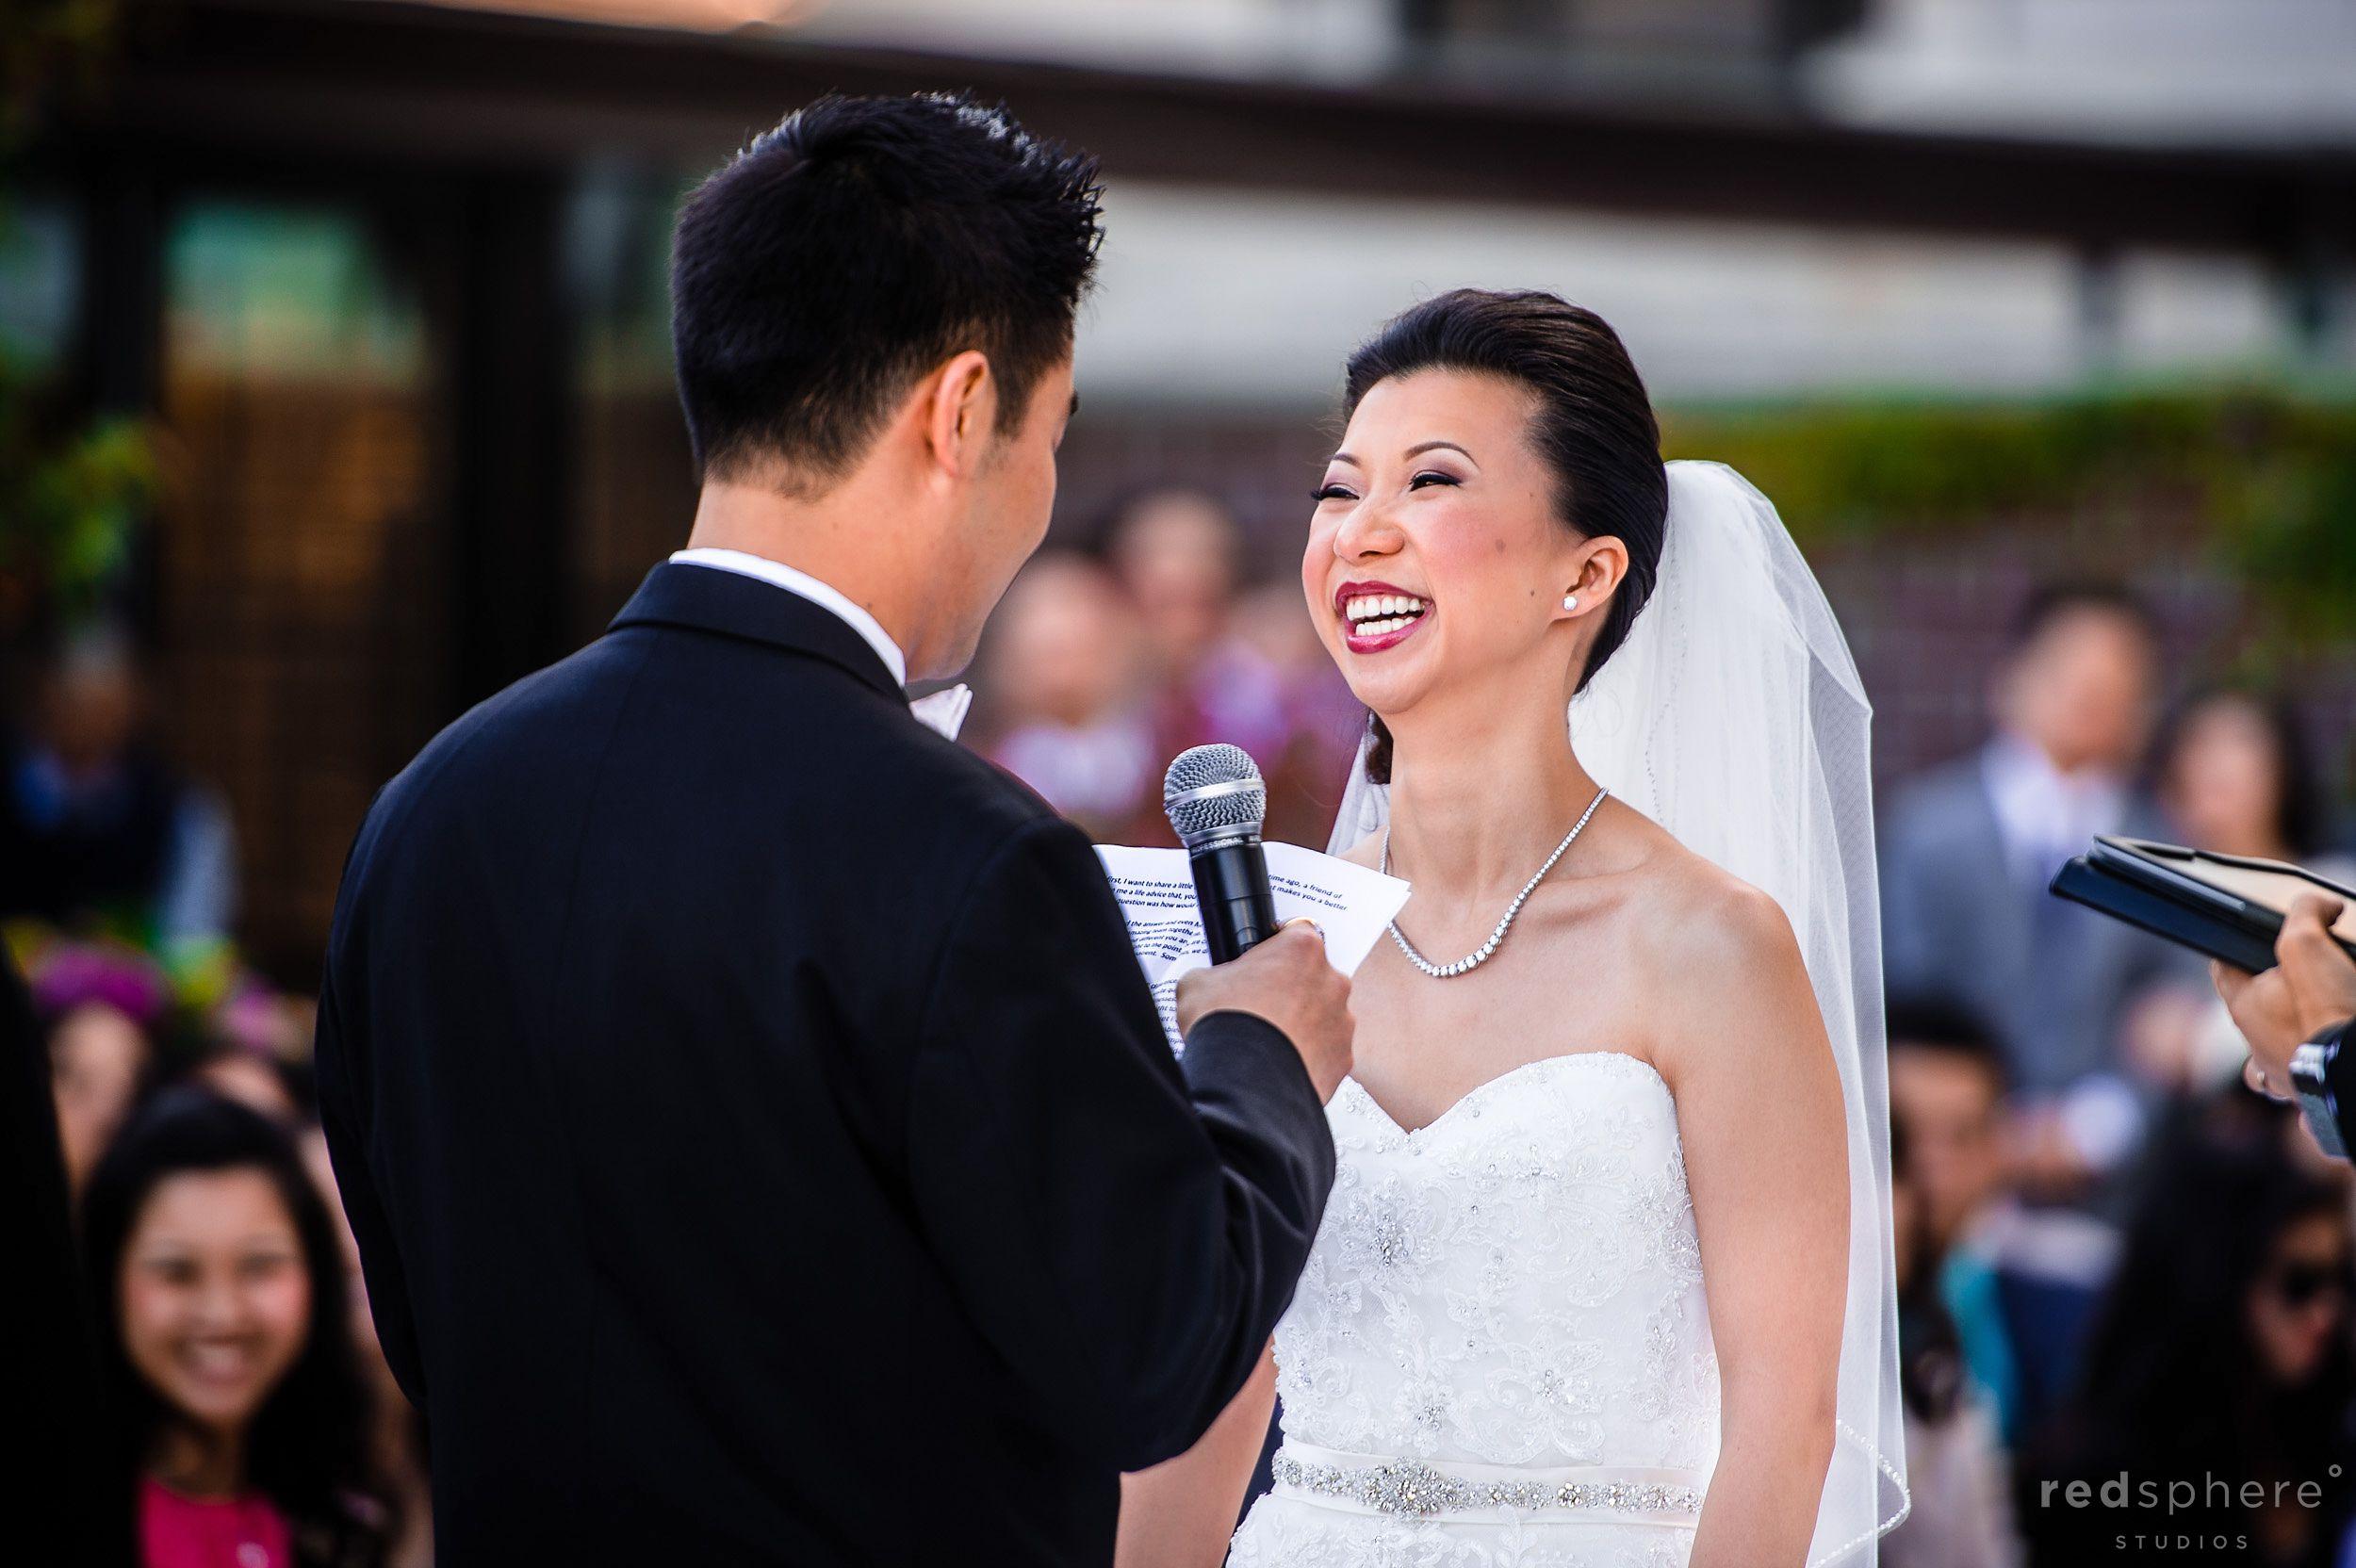 Bride Smiling Hard While Groom Speaks at Wedding Ceremony, Fairmont San Francisco